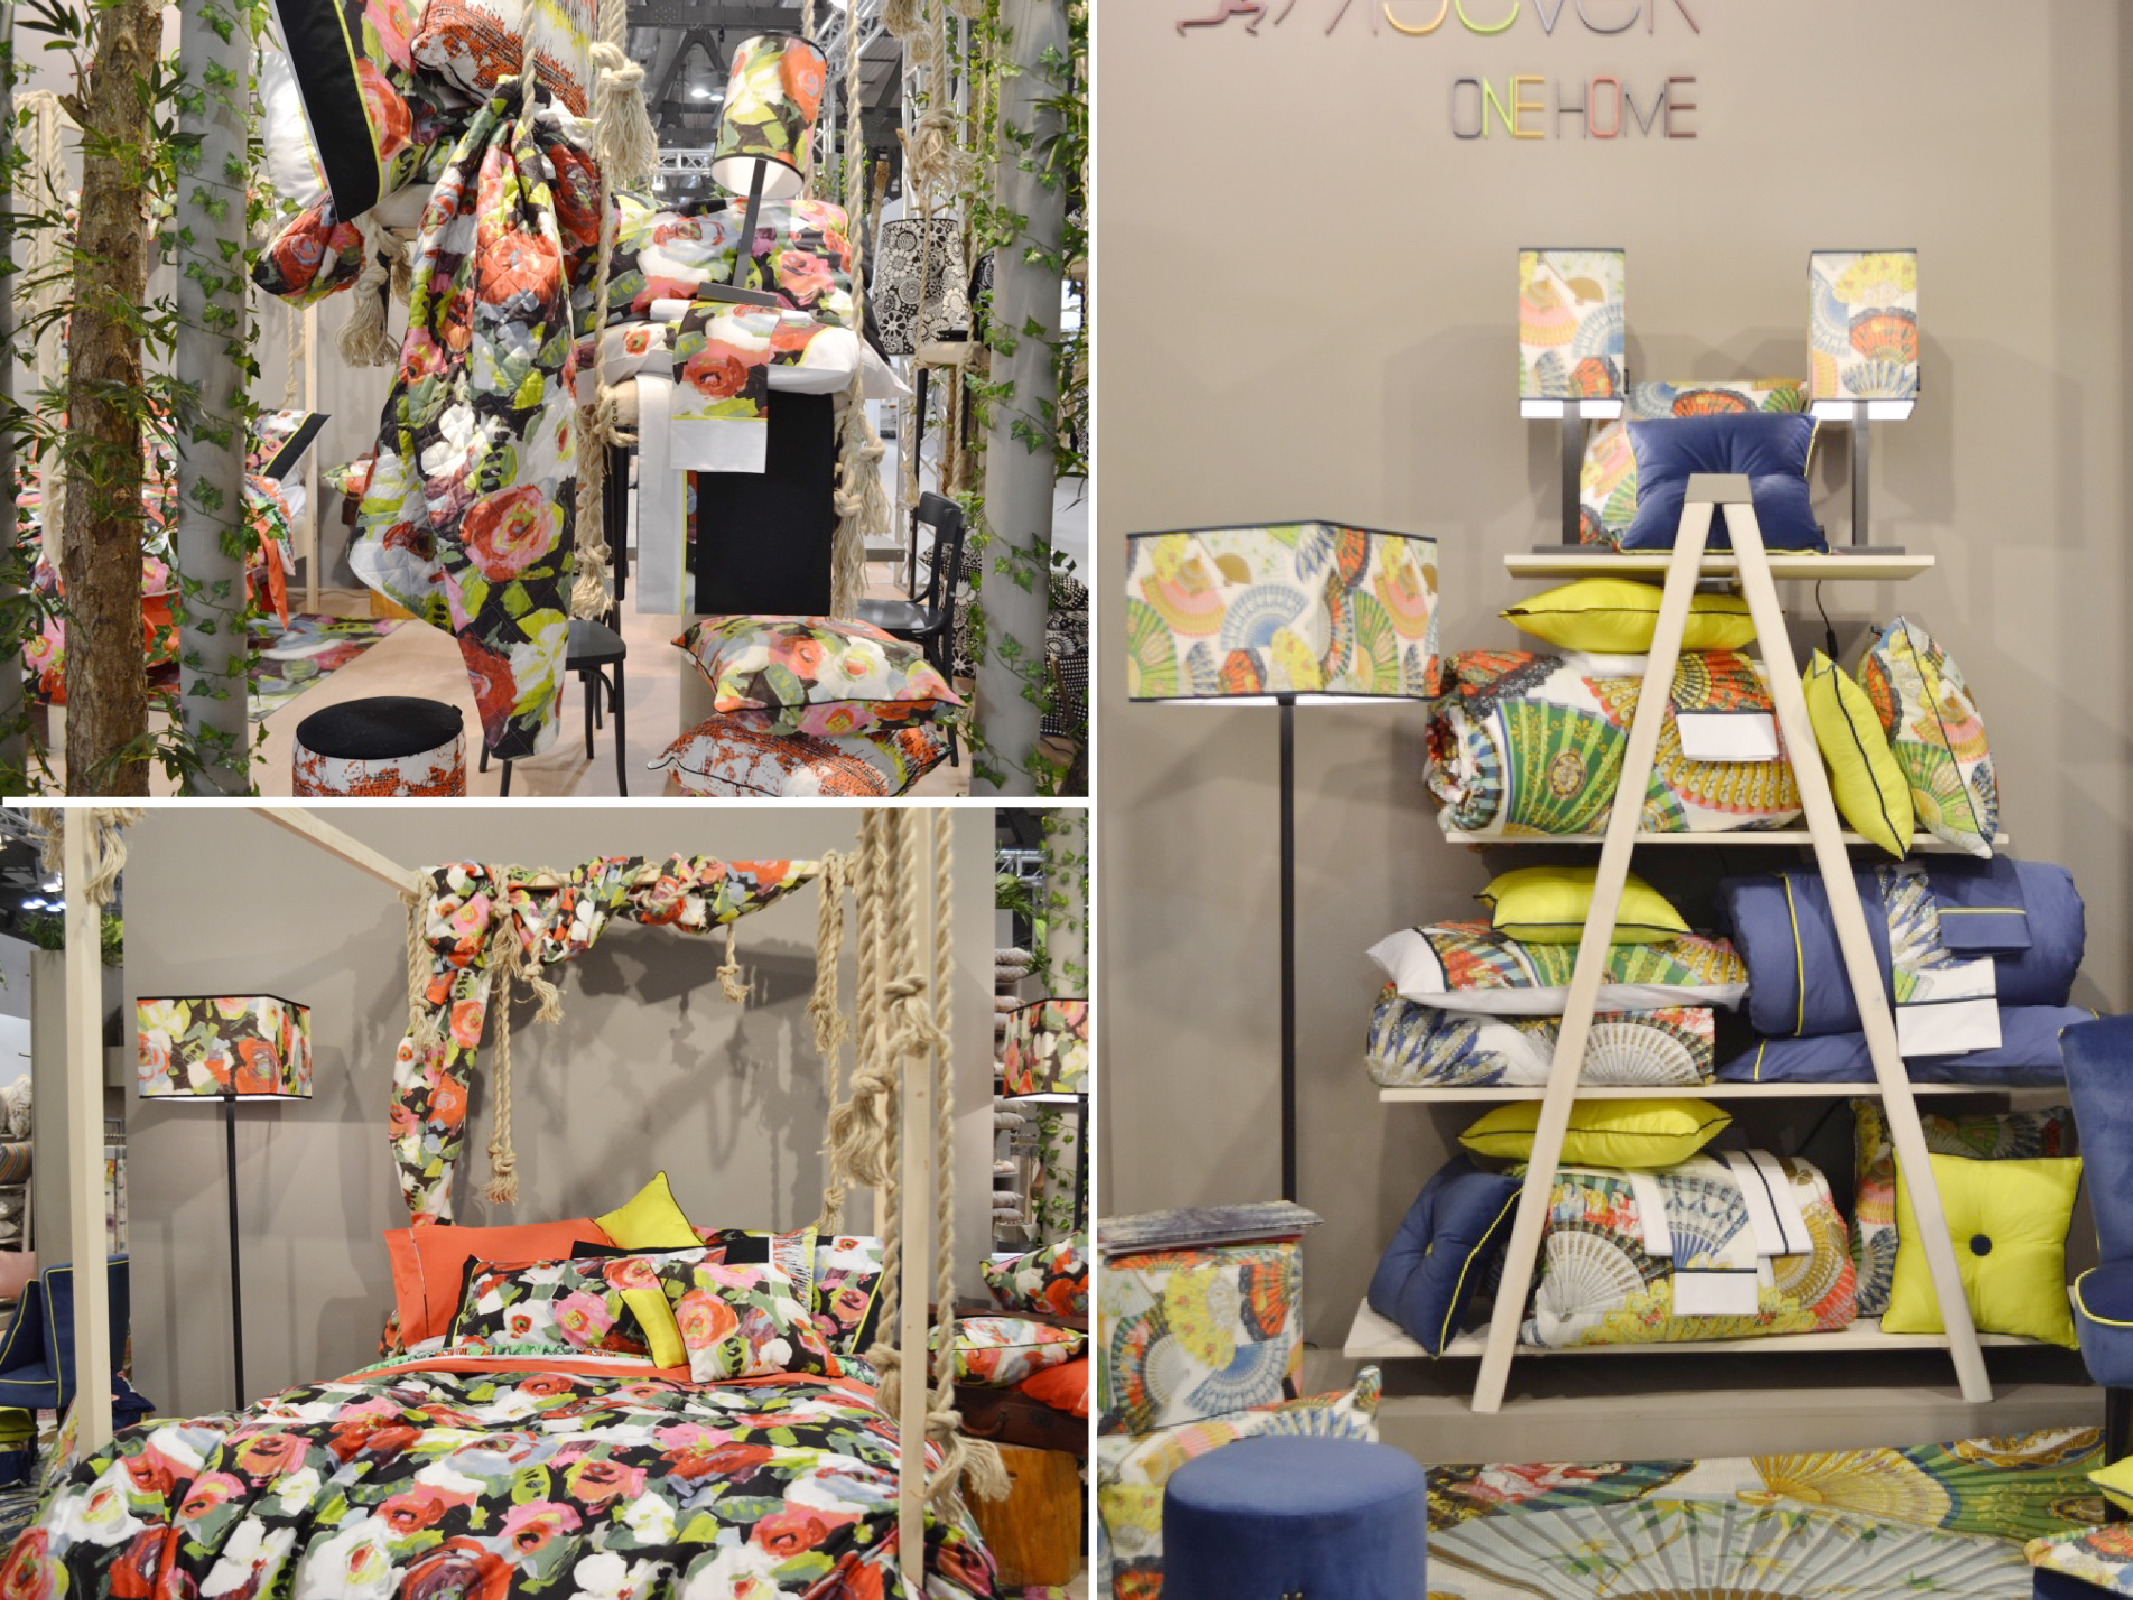 Negozi Per La Casa Milano visual merchandising per la casa - milan retail store